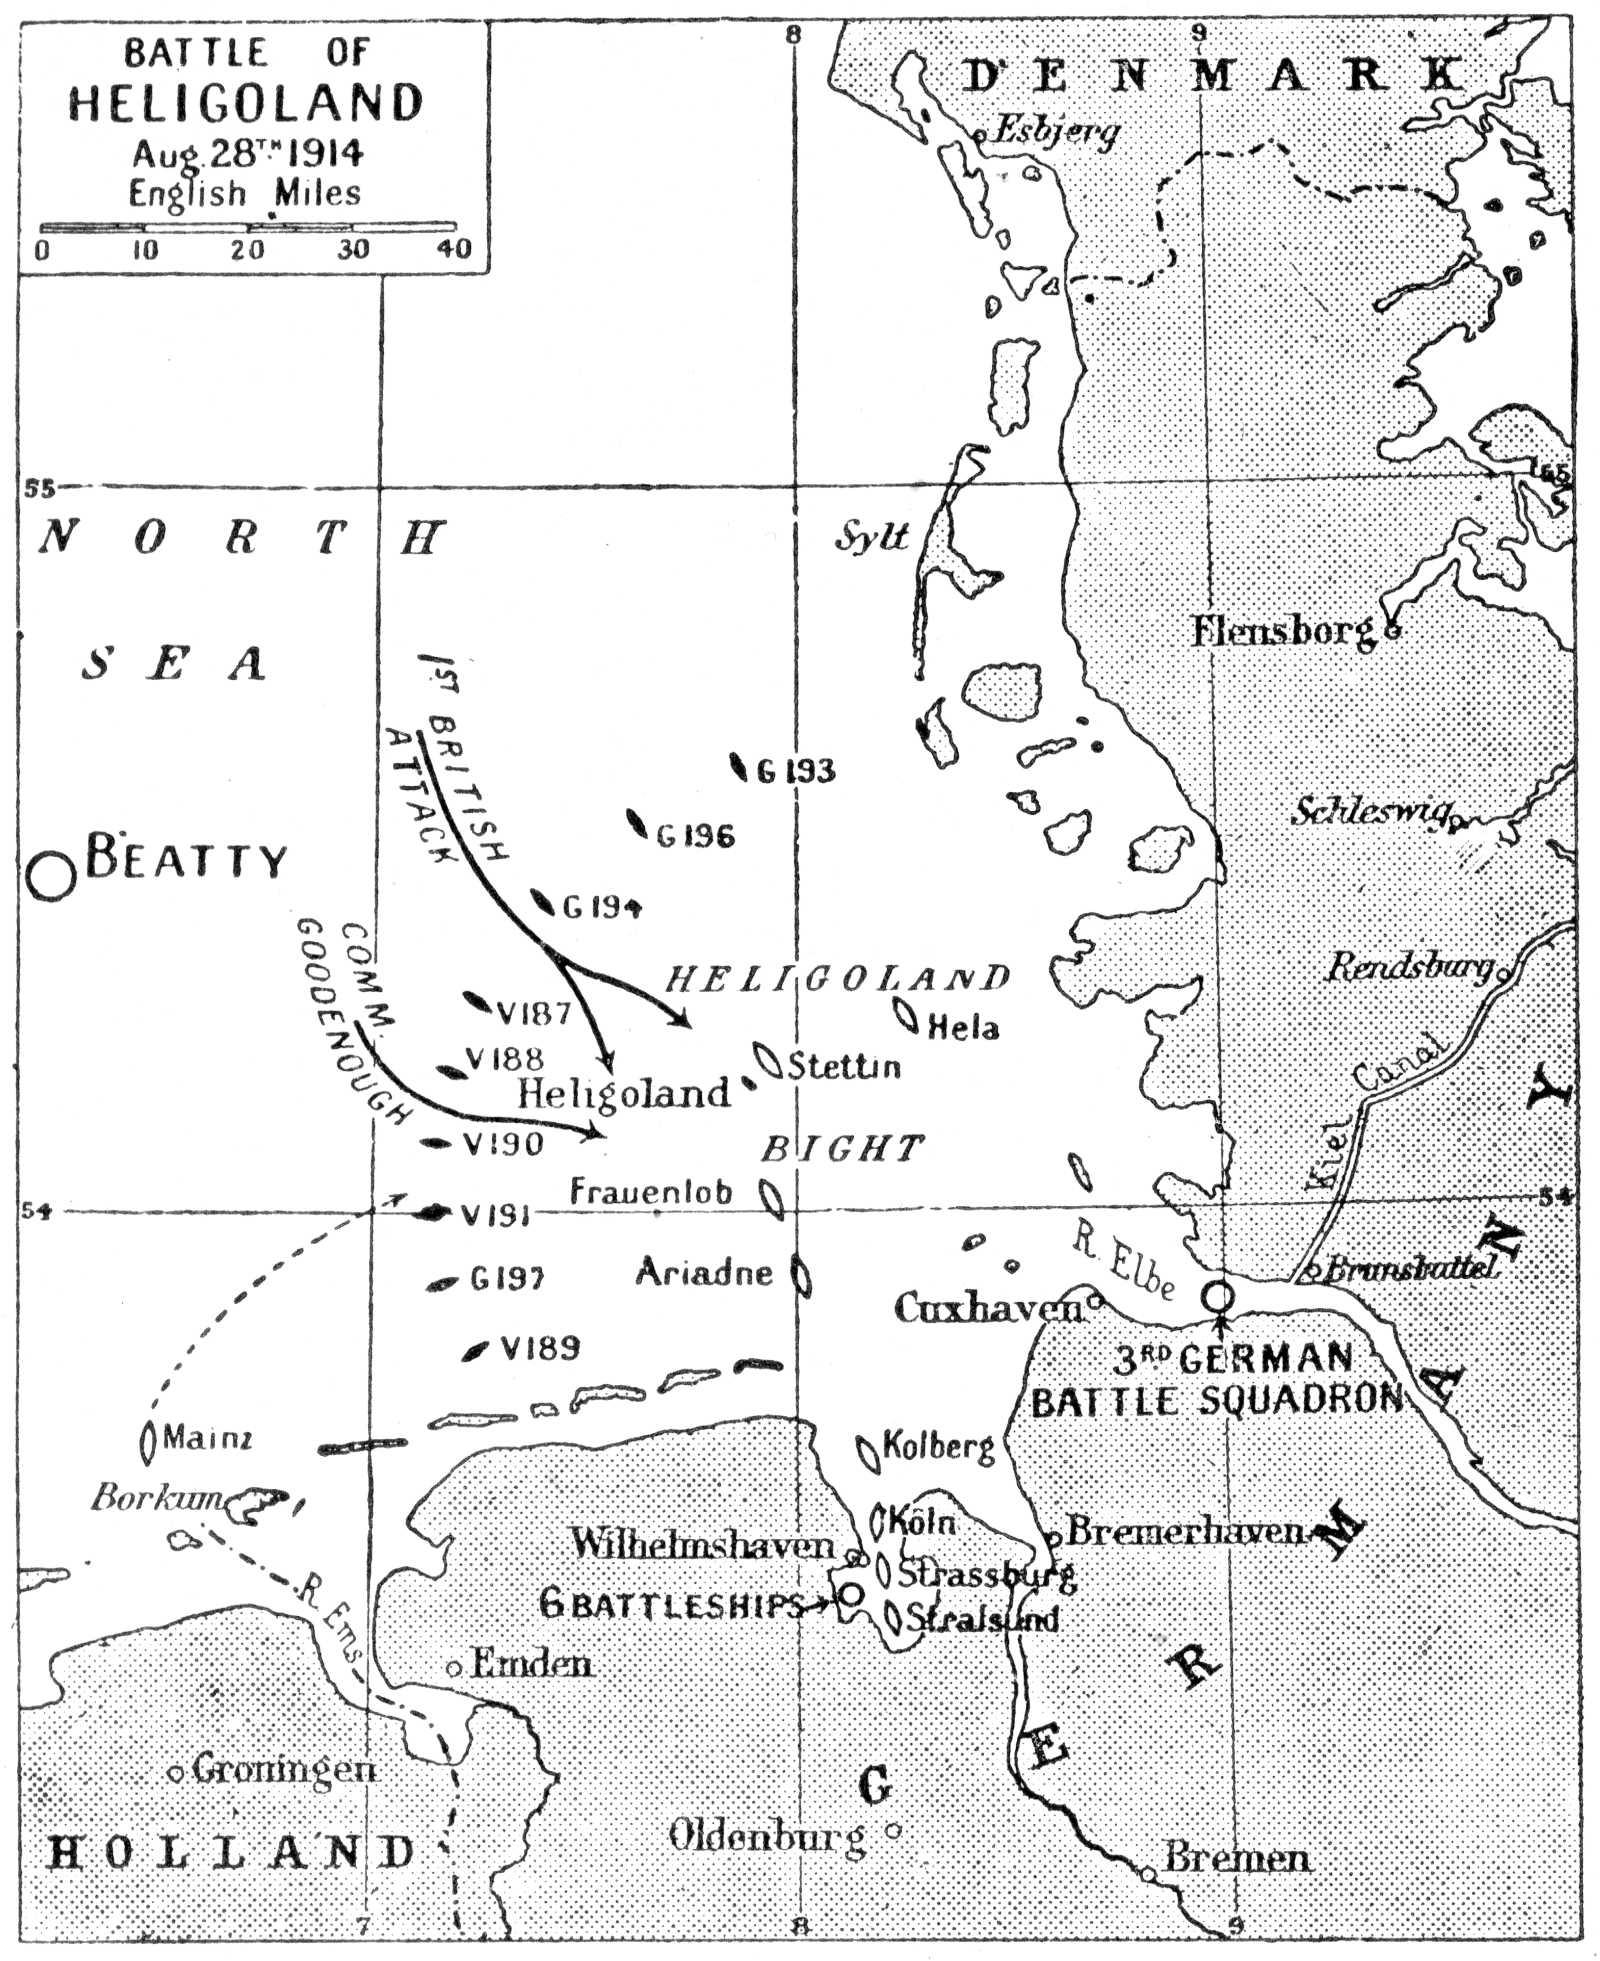 Map of the Battle of Heligoland Bight. Via Probert Encyclopedia